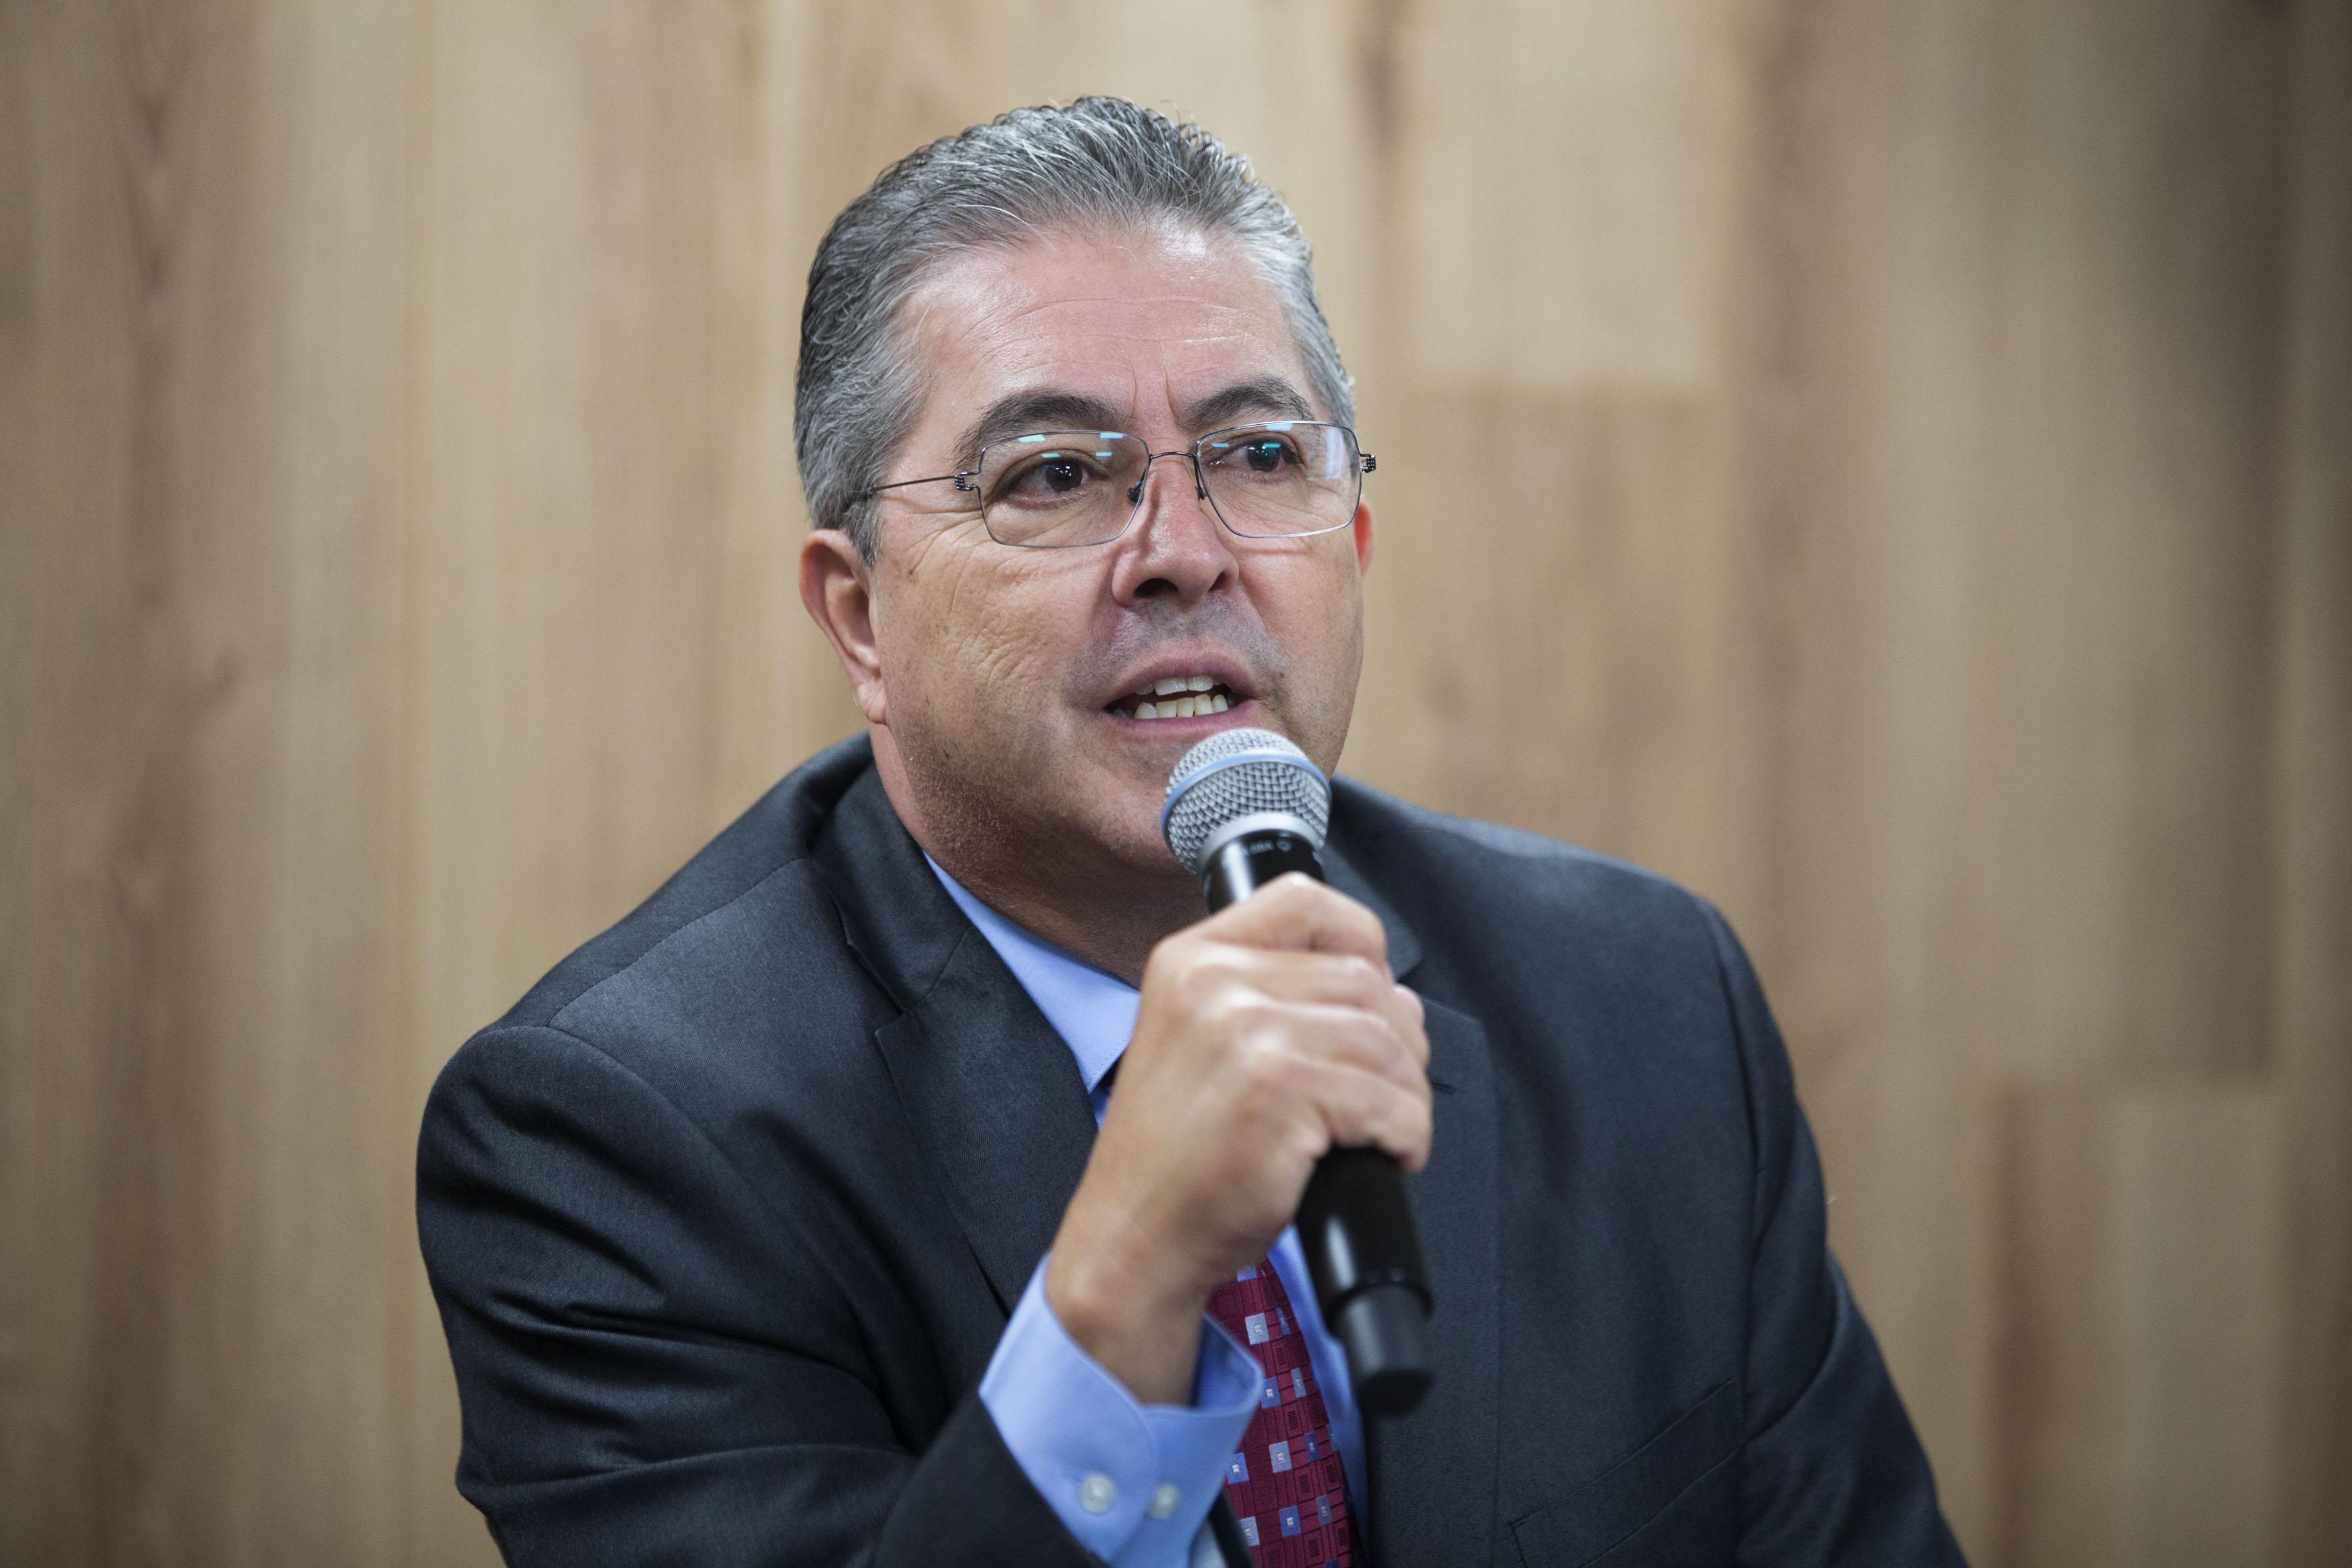 Carlos Beaz Zárate